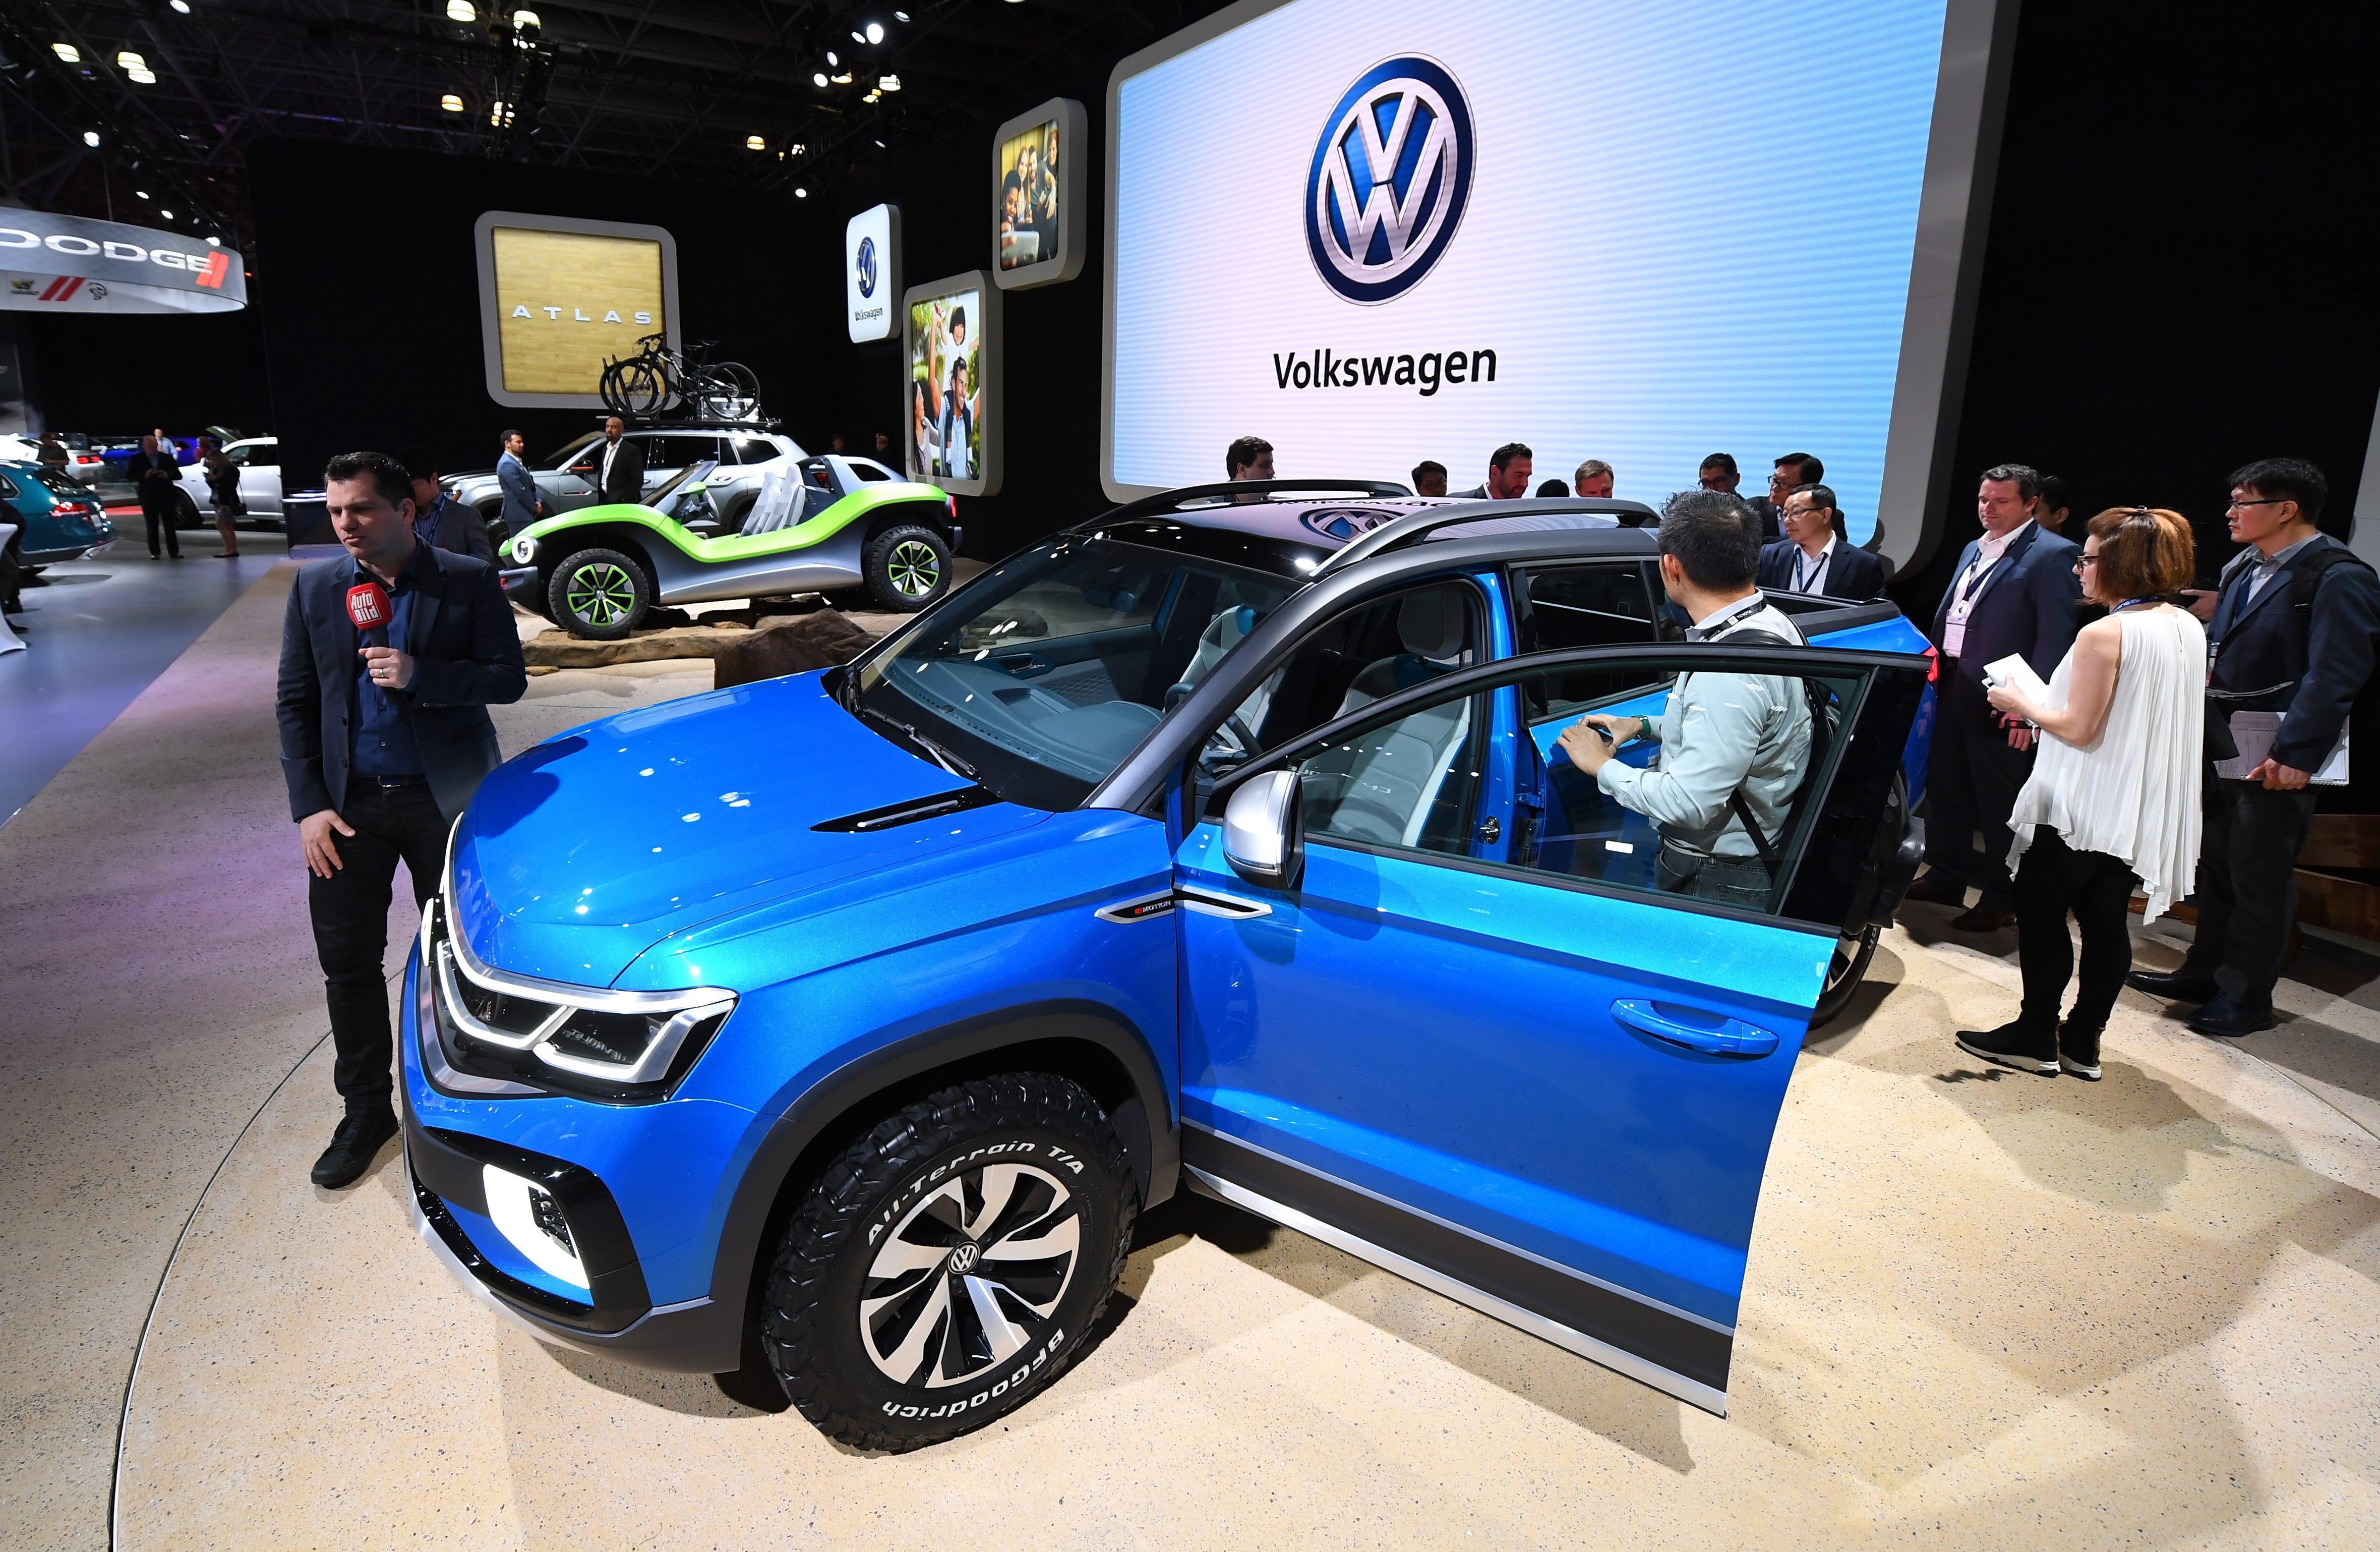 VW Tarok pickup concept on display at the New York International Auto Show.